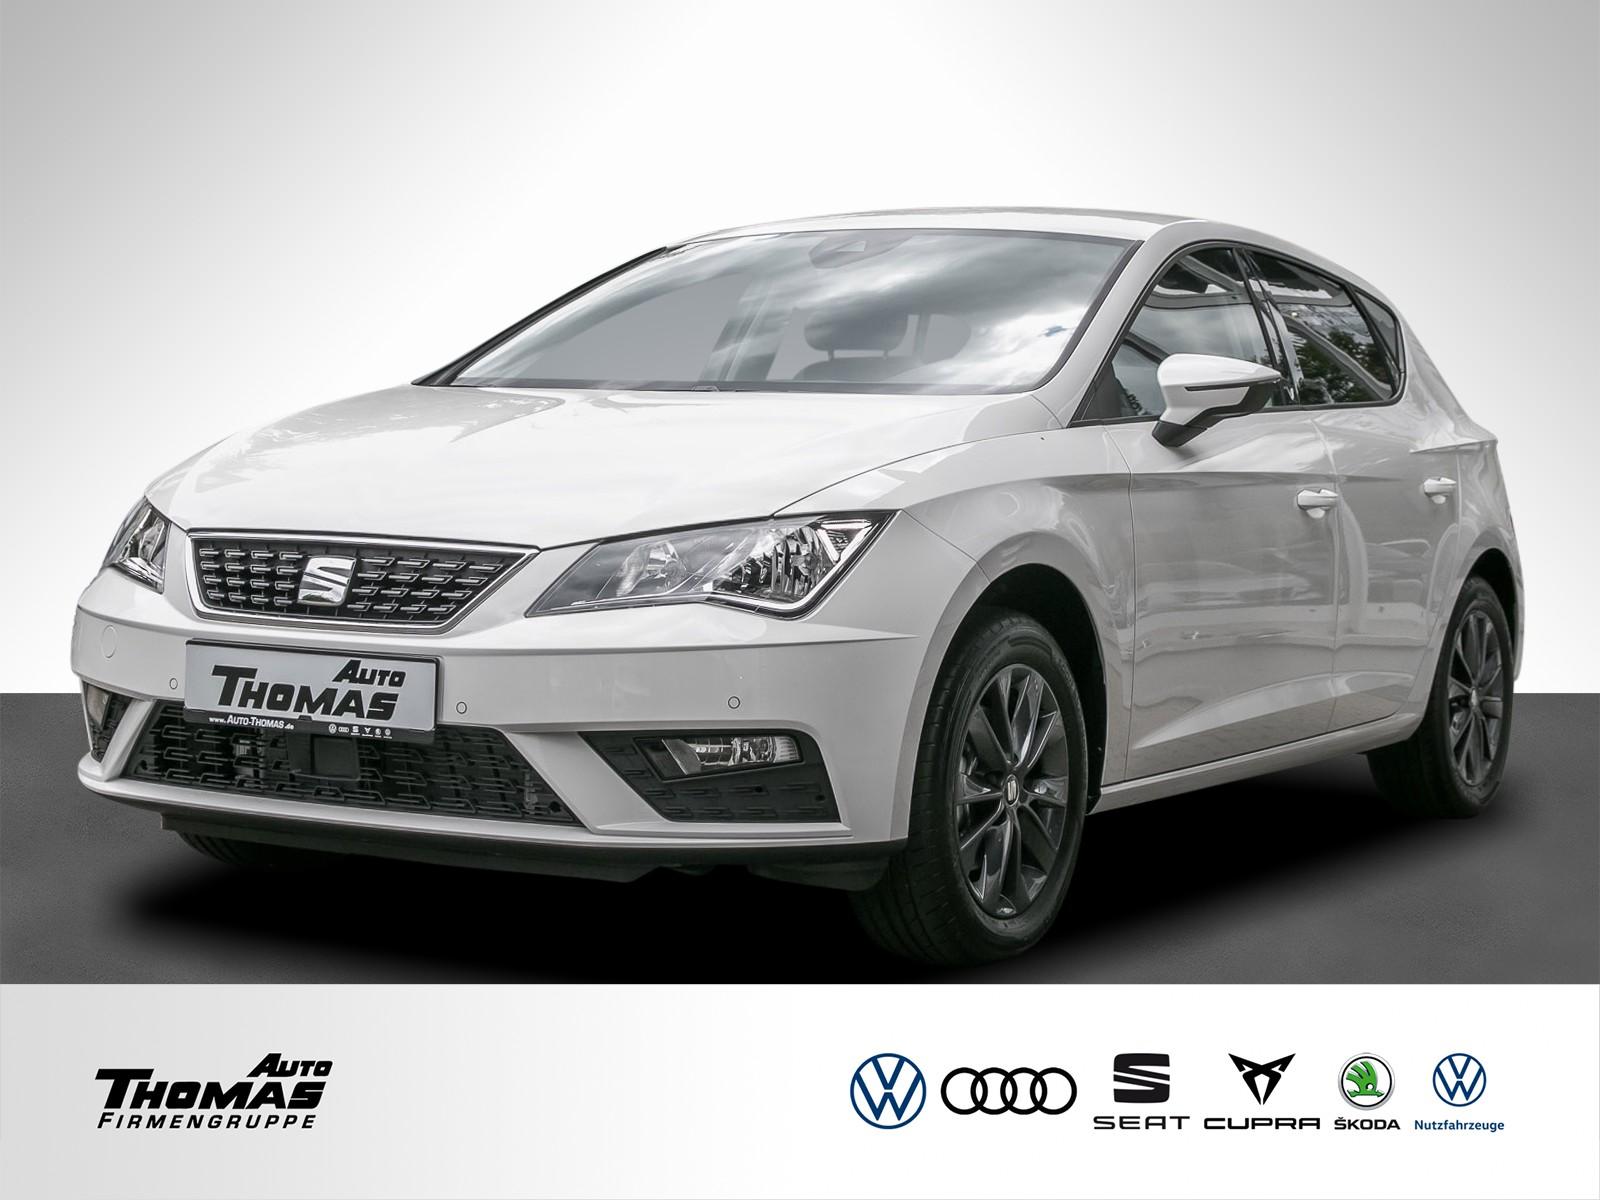 Seat Leon Style 1.5 TSI 130 PS 6-Gang FULL LINK + MEDIA, Jahr 2020, Benzin